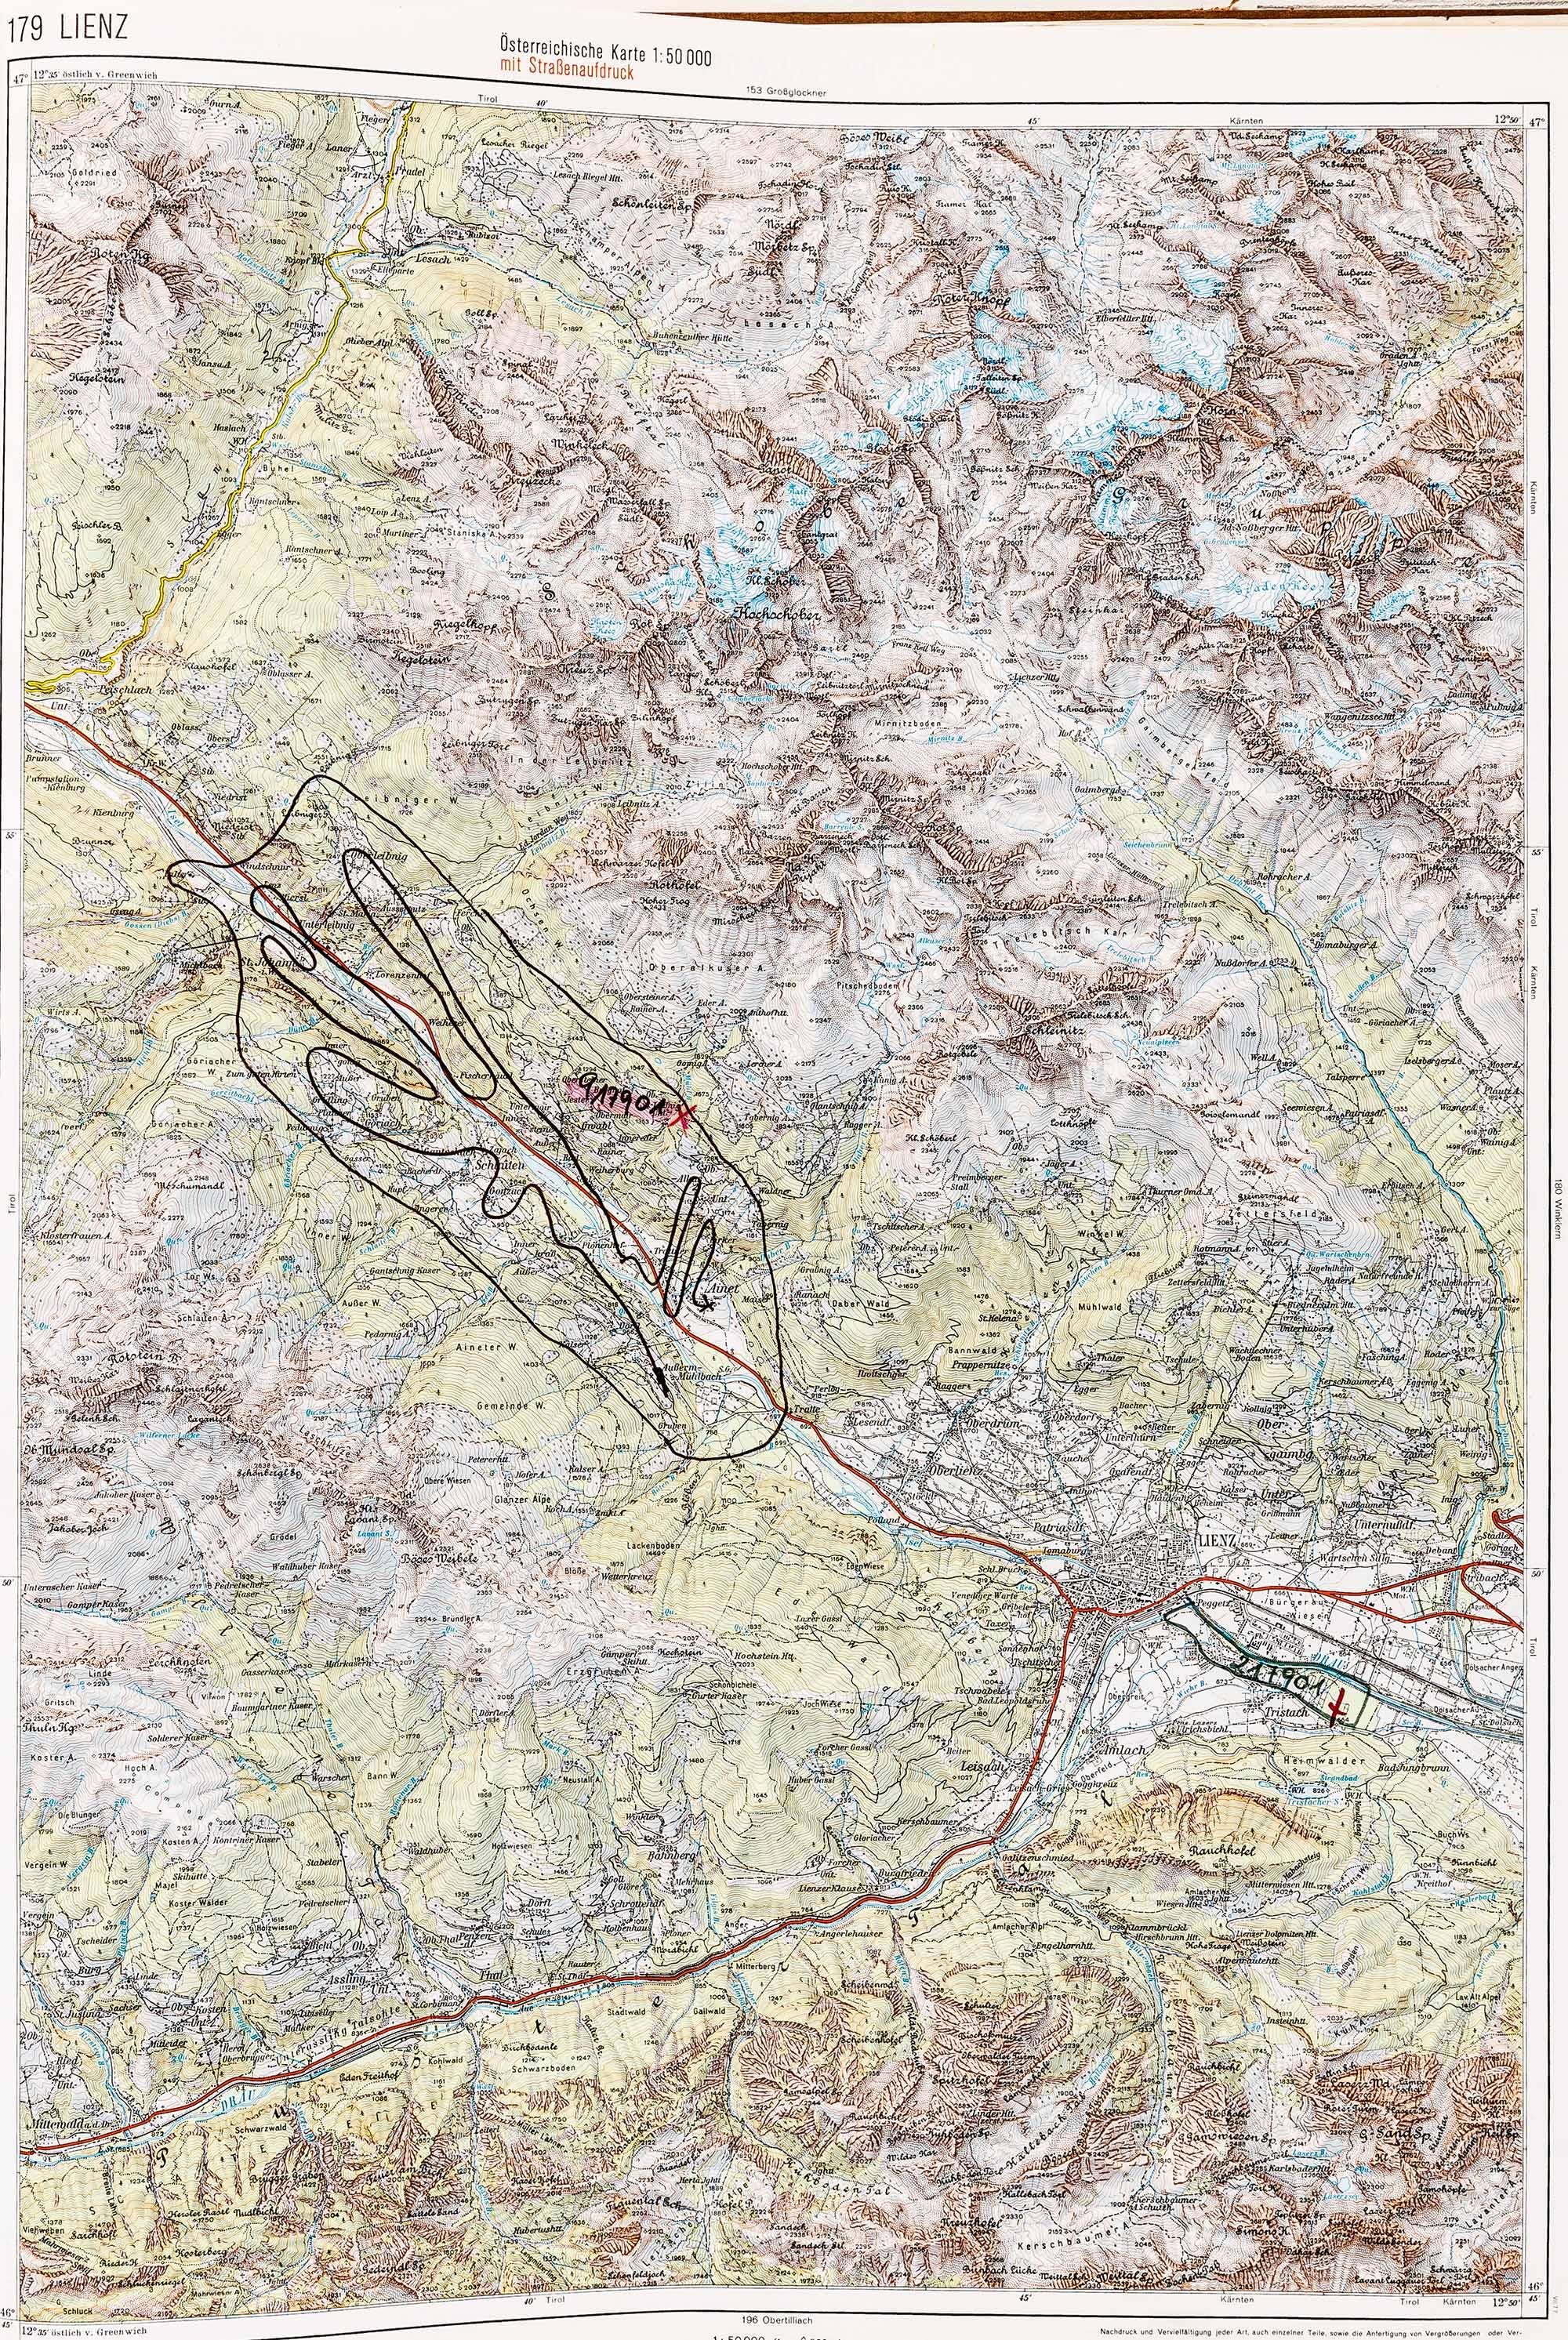 1979-1982 Karte 179